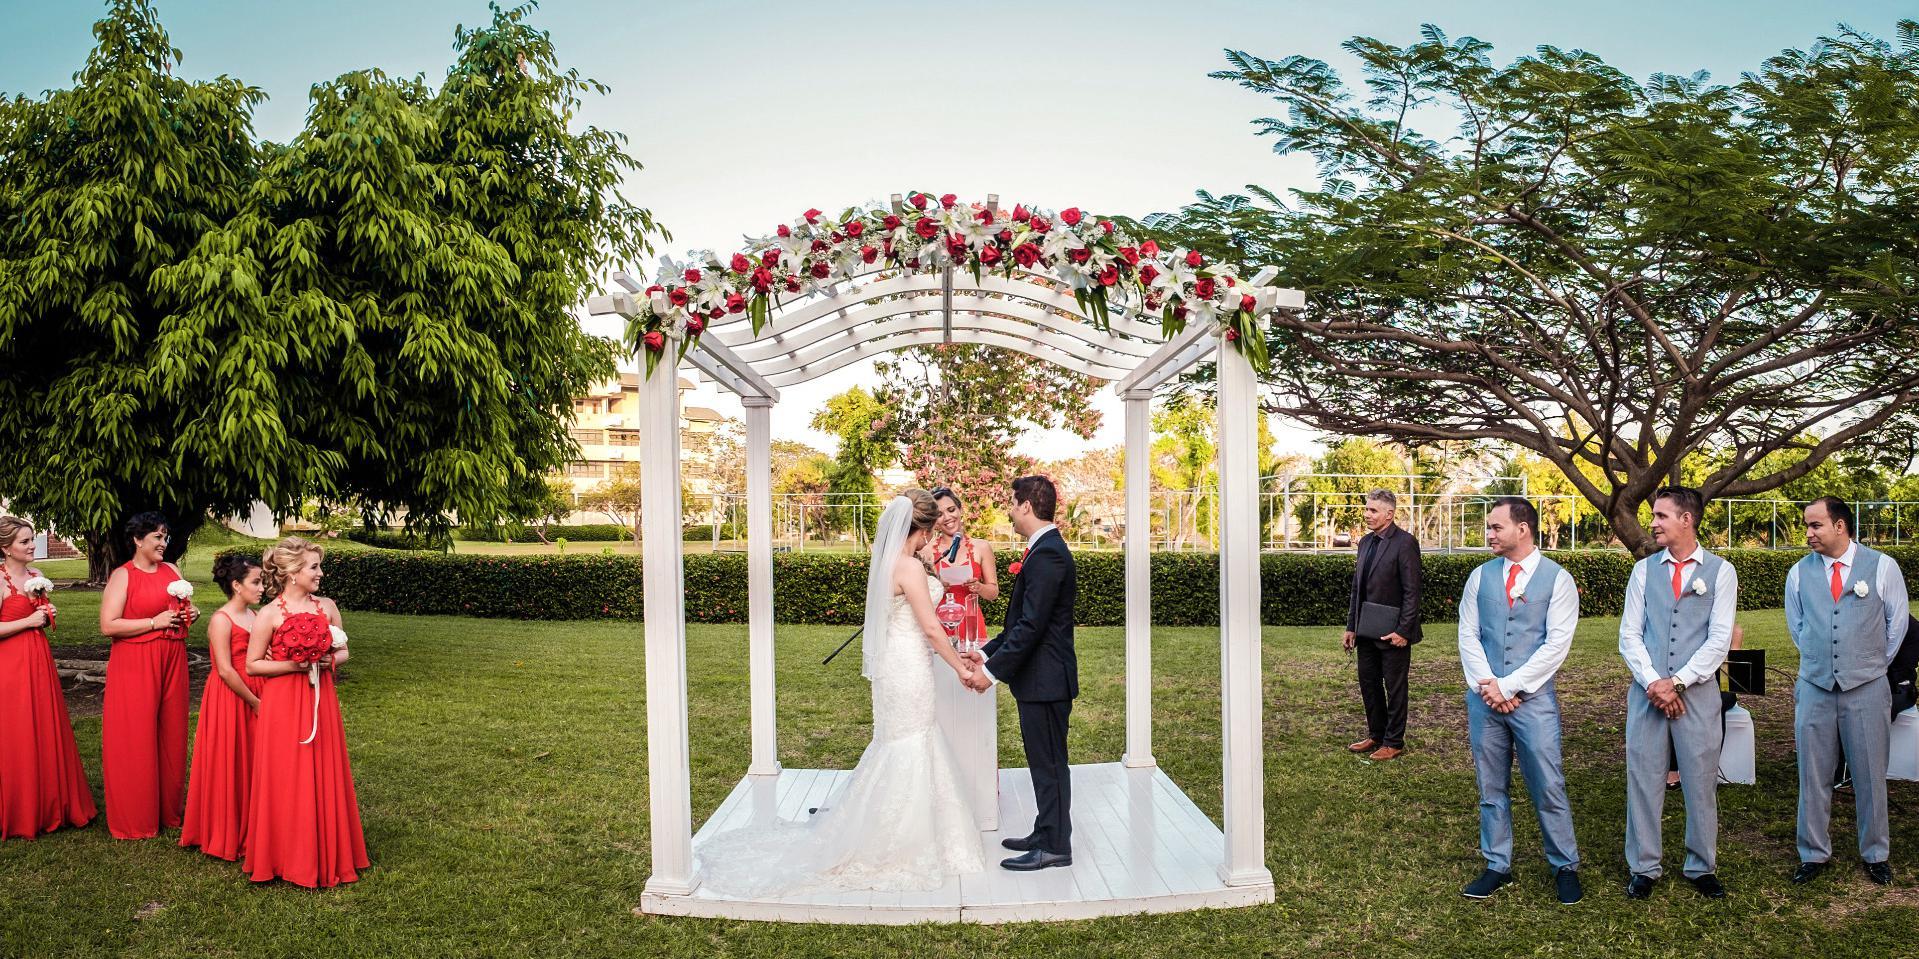 bodas-sin-clasificar-sin-tema-cuba-28221.jpg